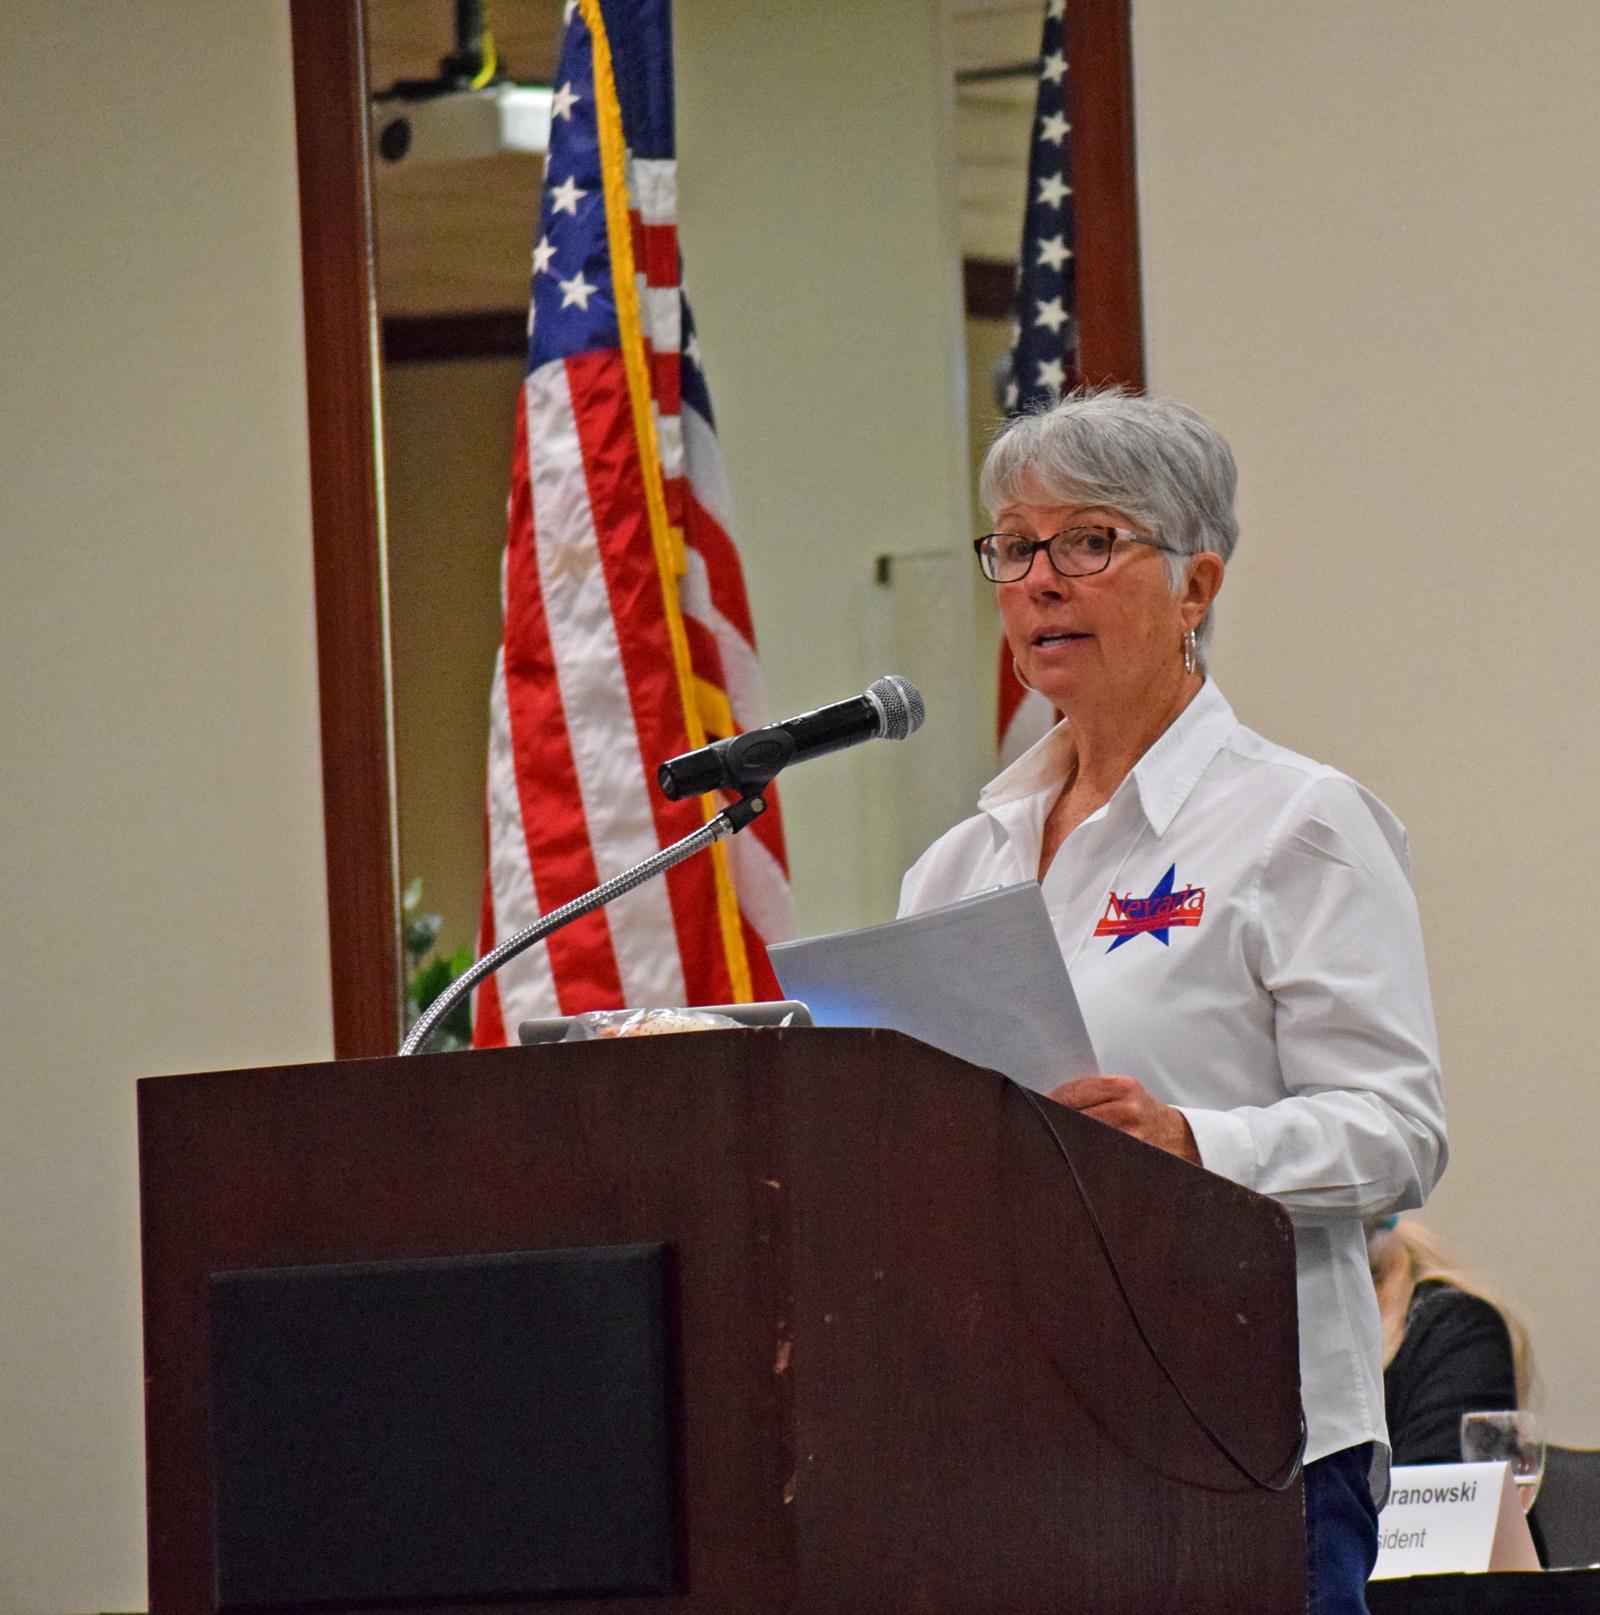 NvFRW Oct 13 2018 NvFRW President Diane Baranowski.jpg